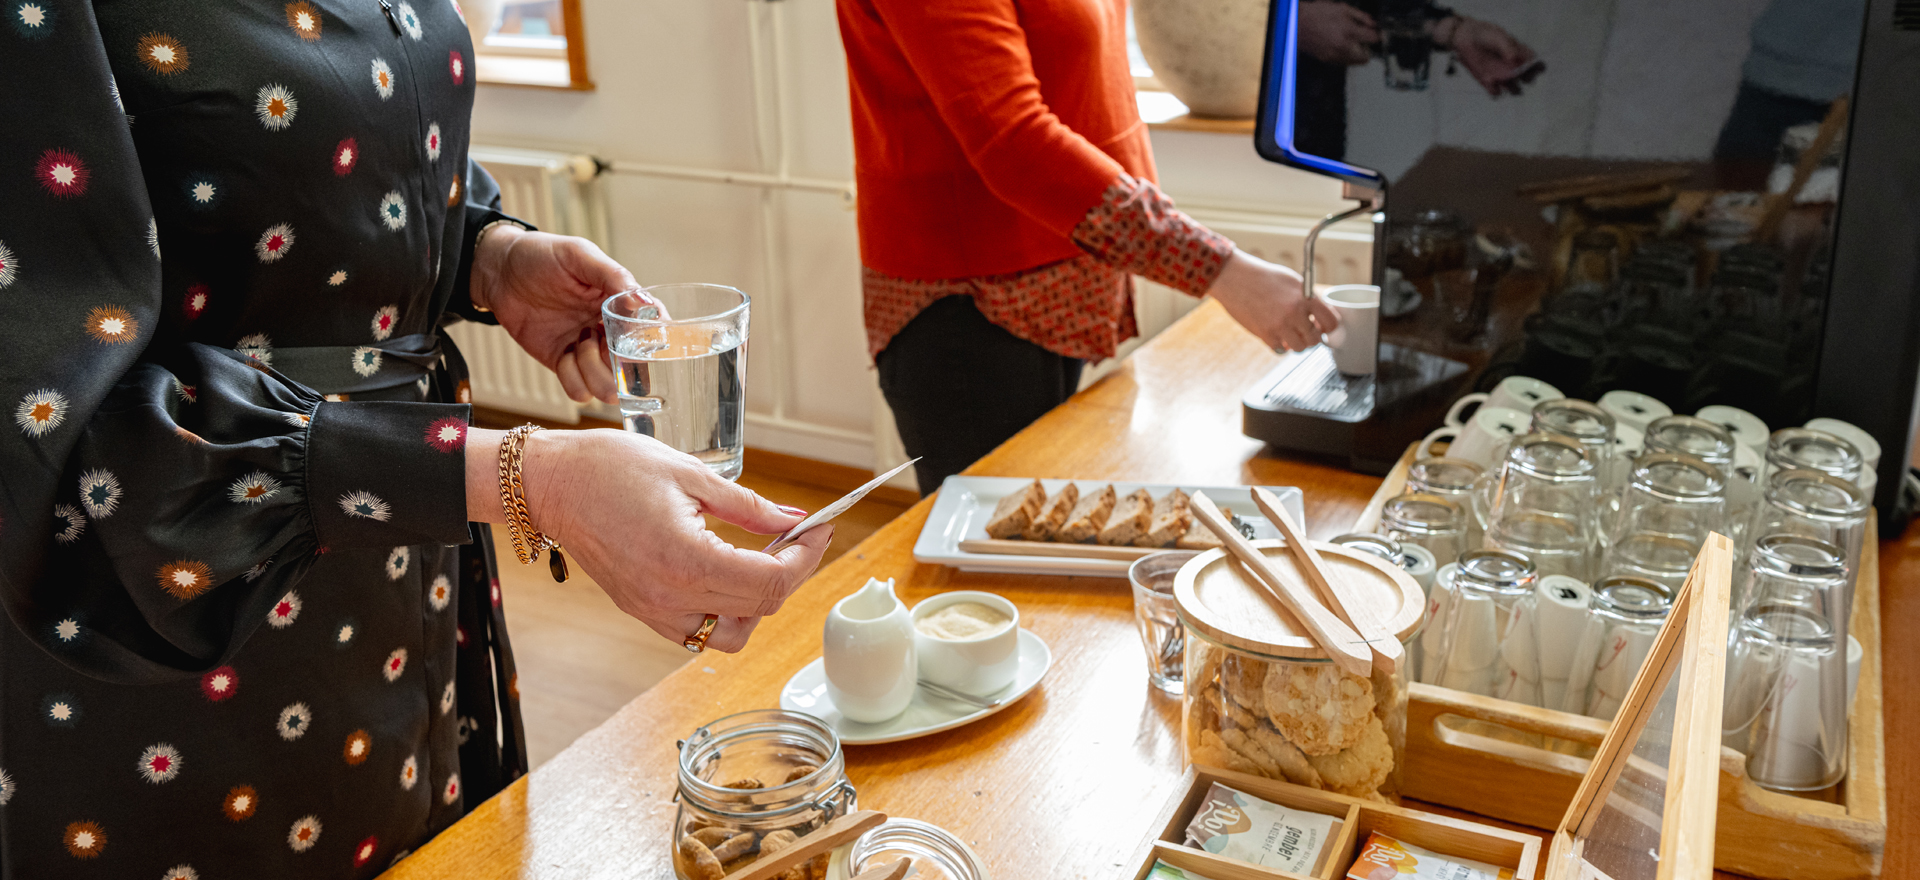 Kloosterhotel ZIN koffie moment rustig thee welkom